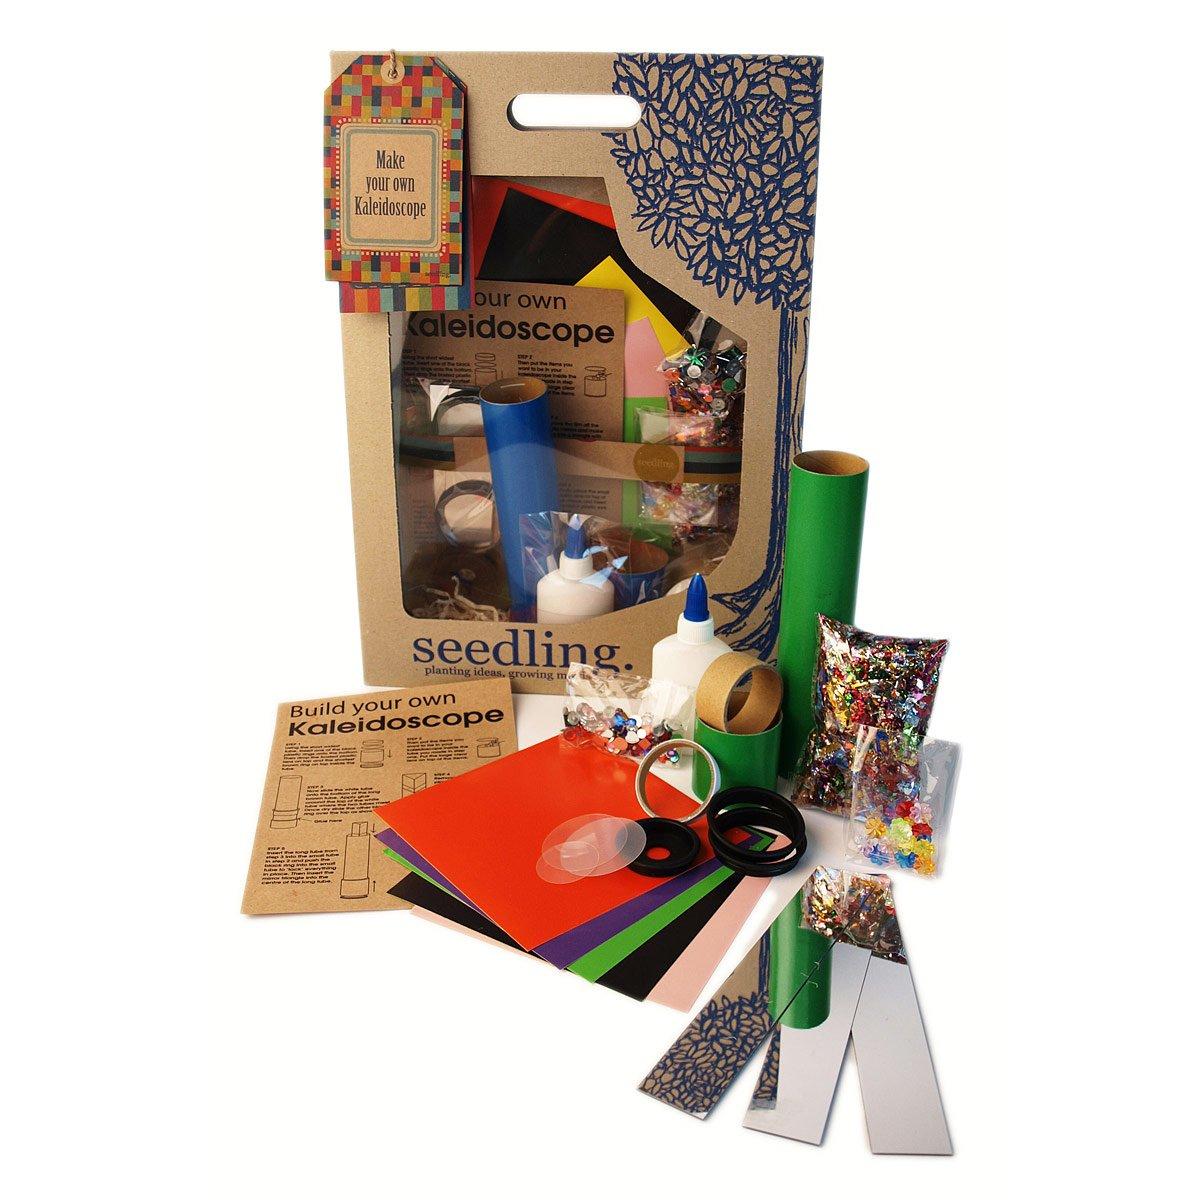 Make Your Own Kaleidoscope Set